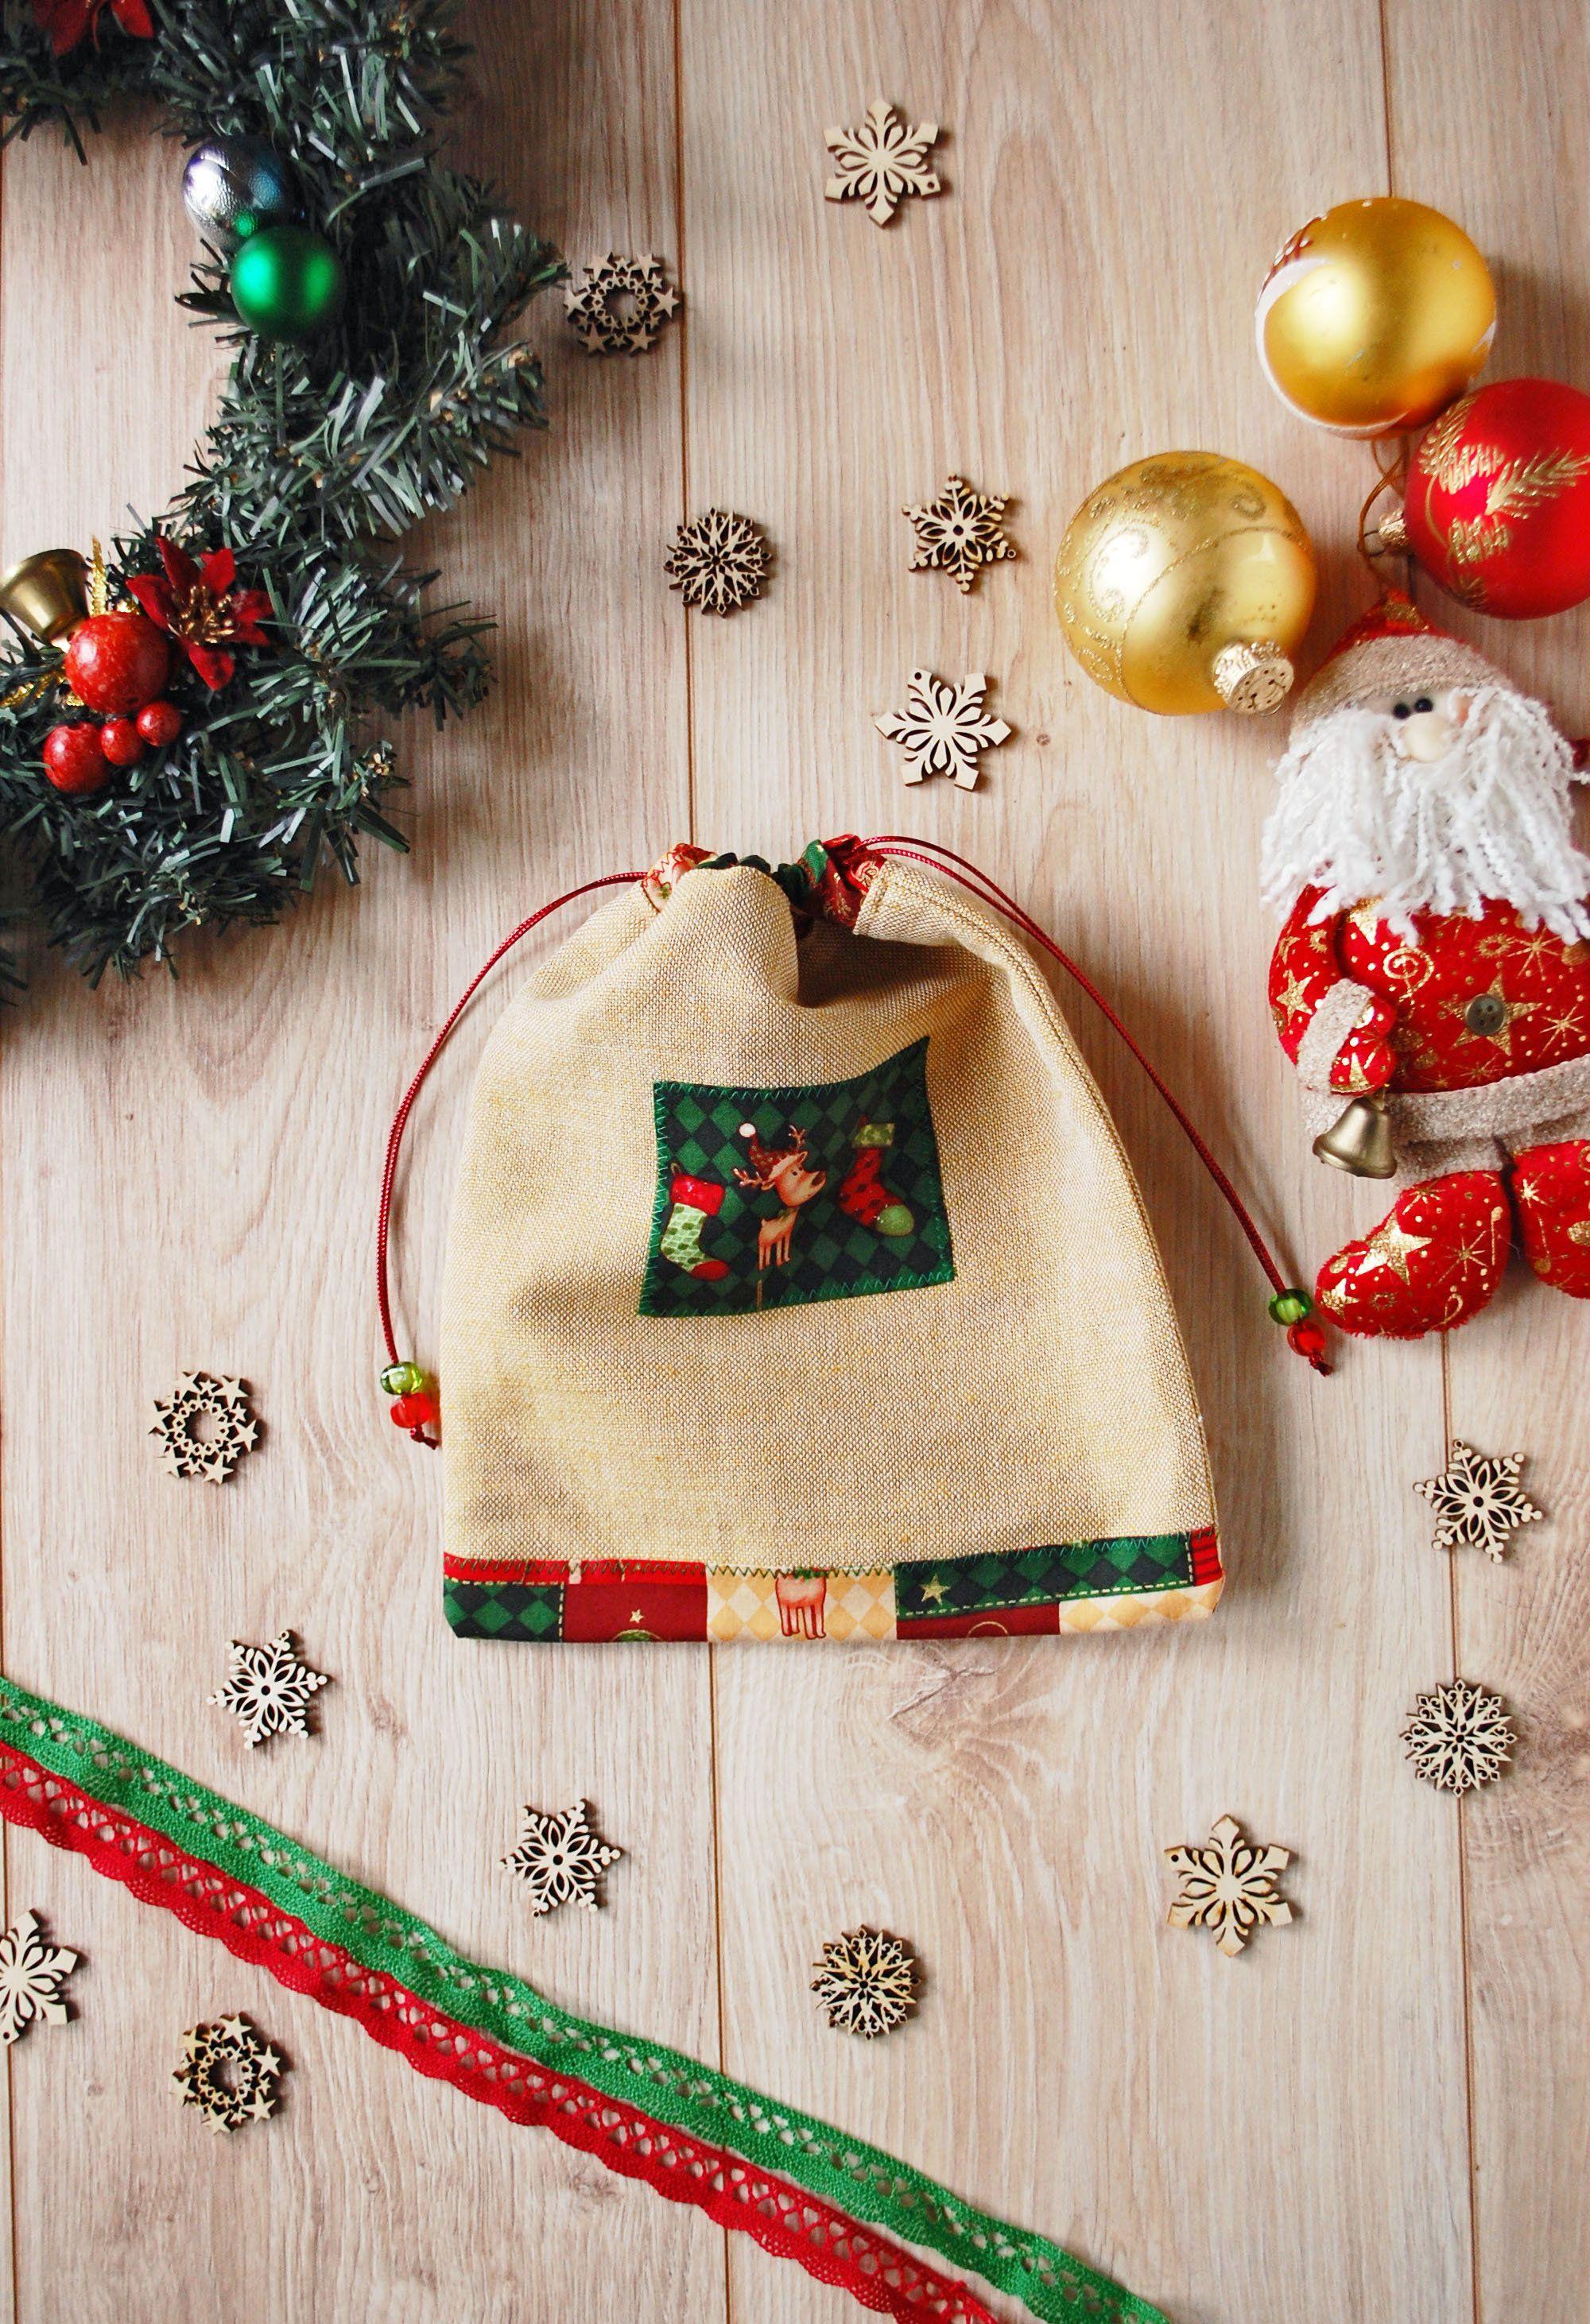 Linen Christmas Gift Bag with Santa\'s Reindeer in 2018   Handmade ...